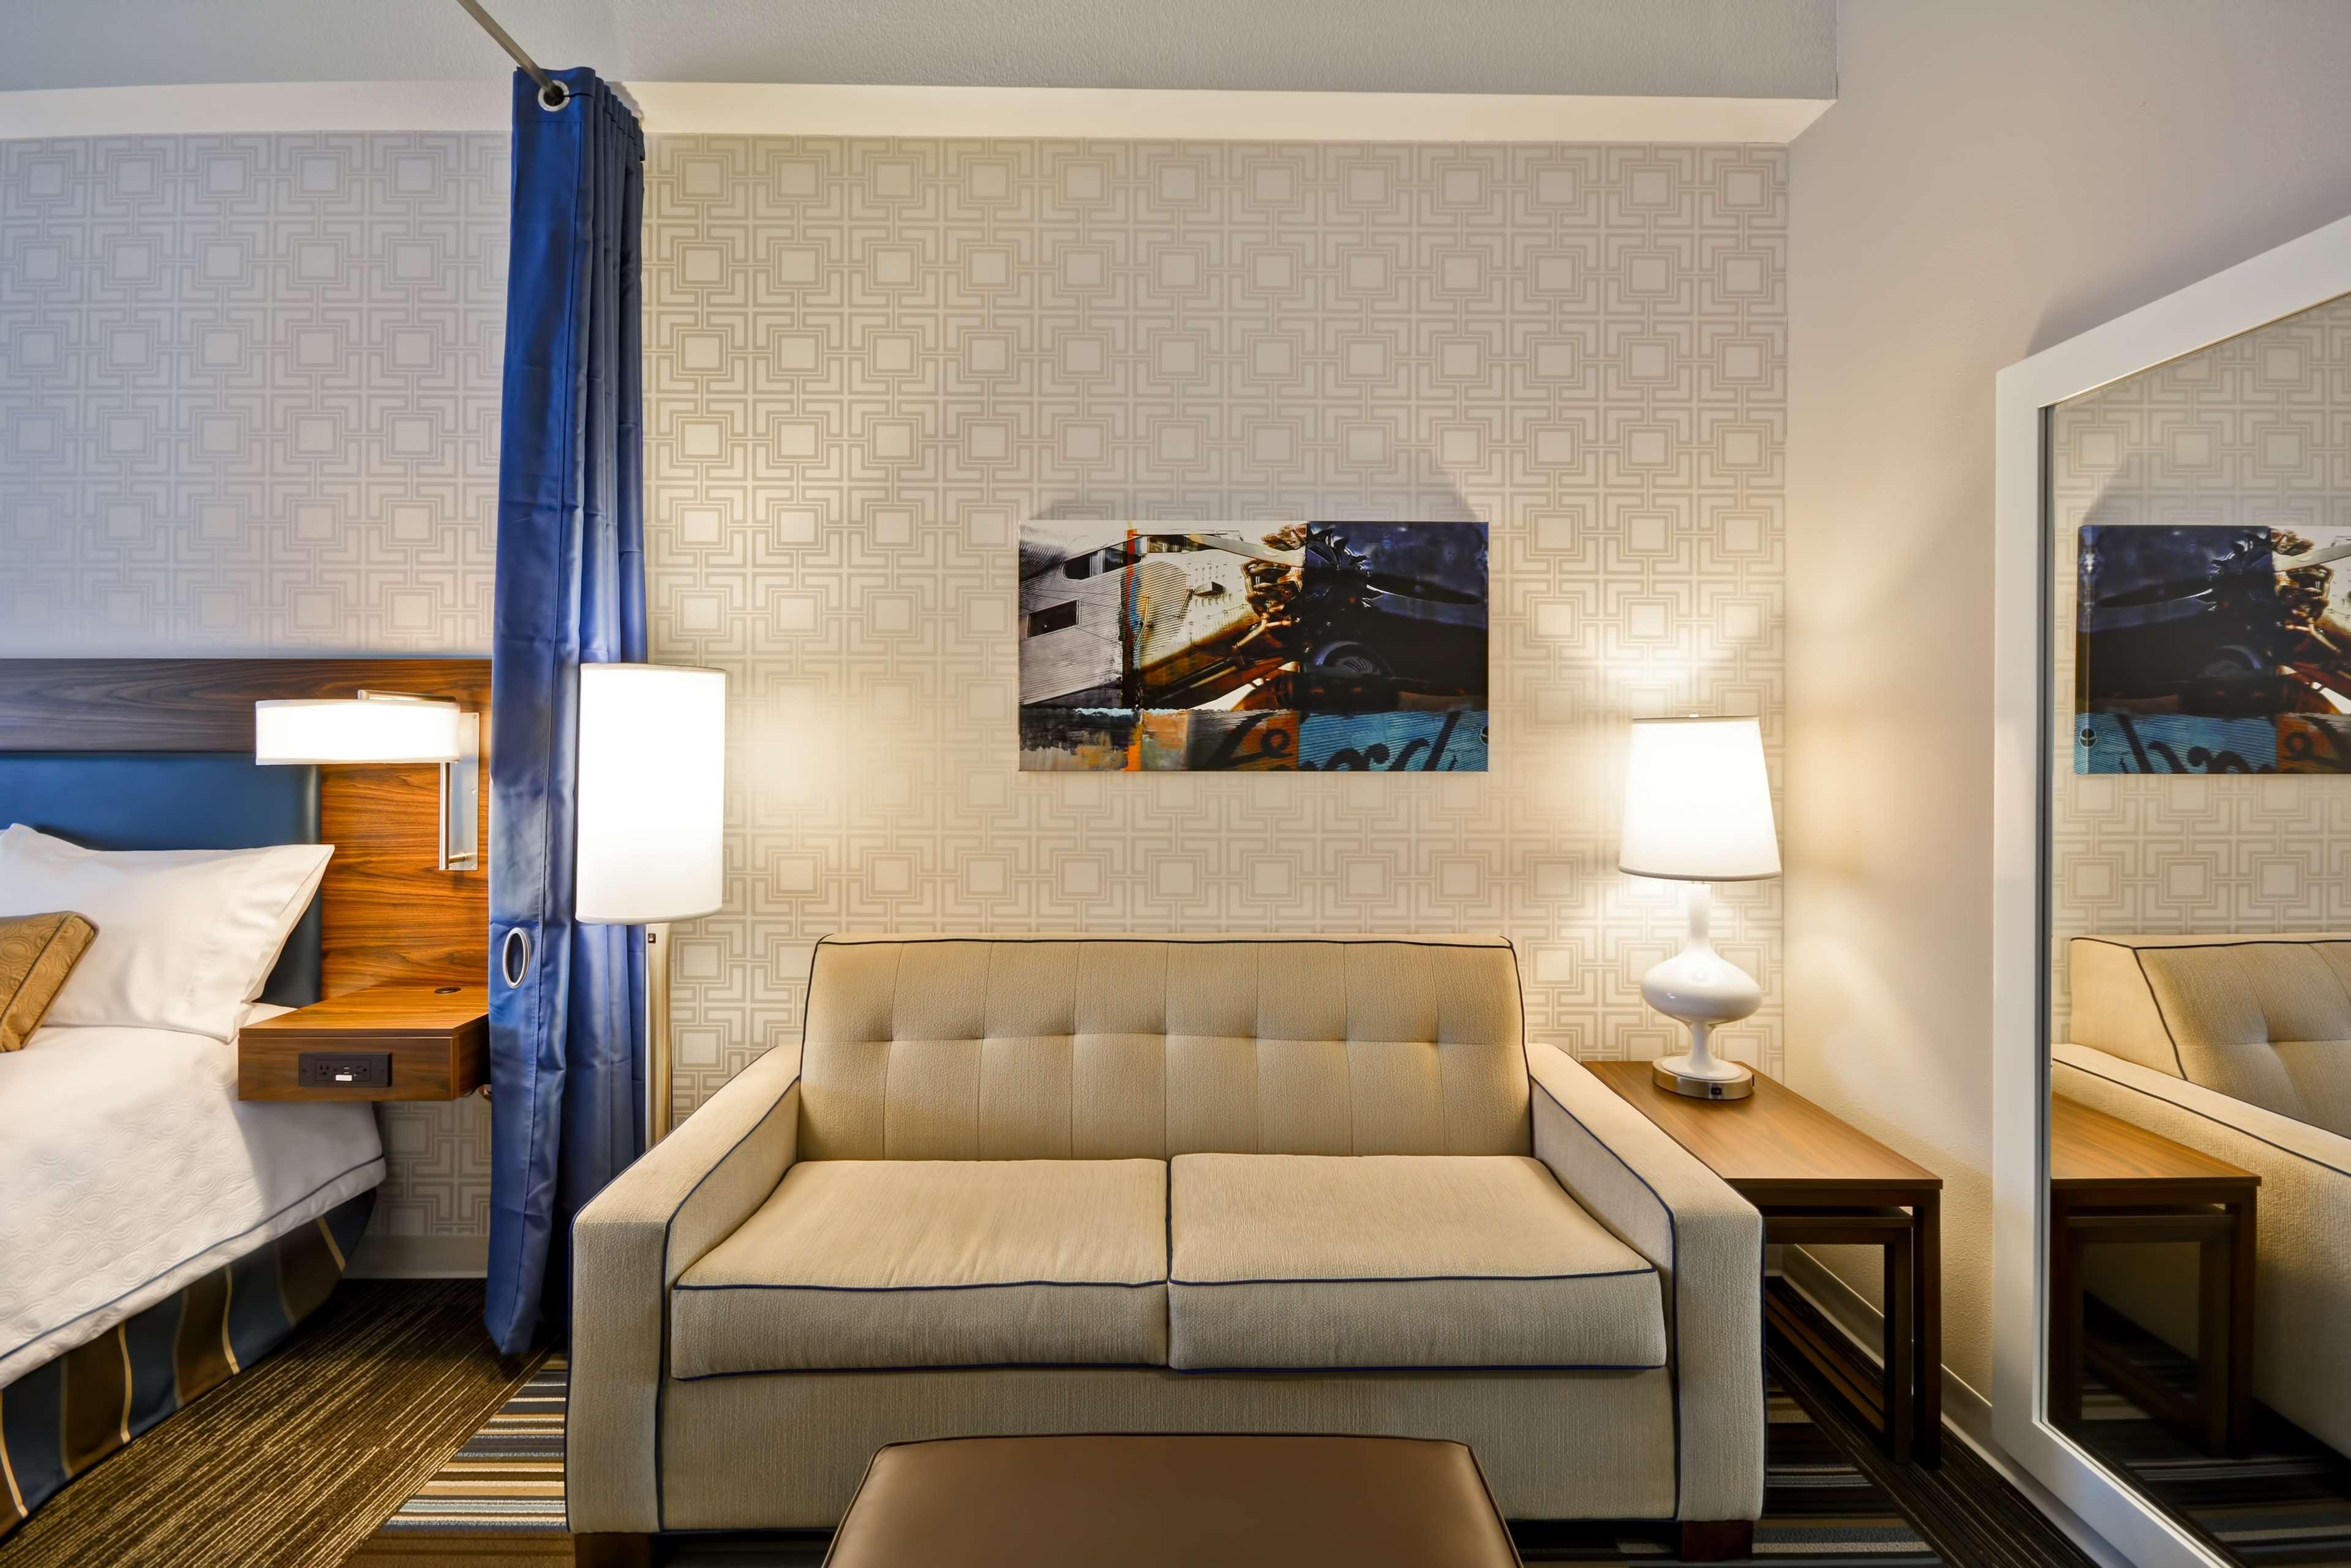 Home2 Suites by Hilton  St. Simons Island image 47